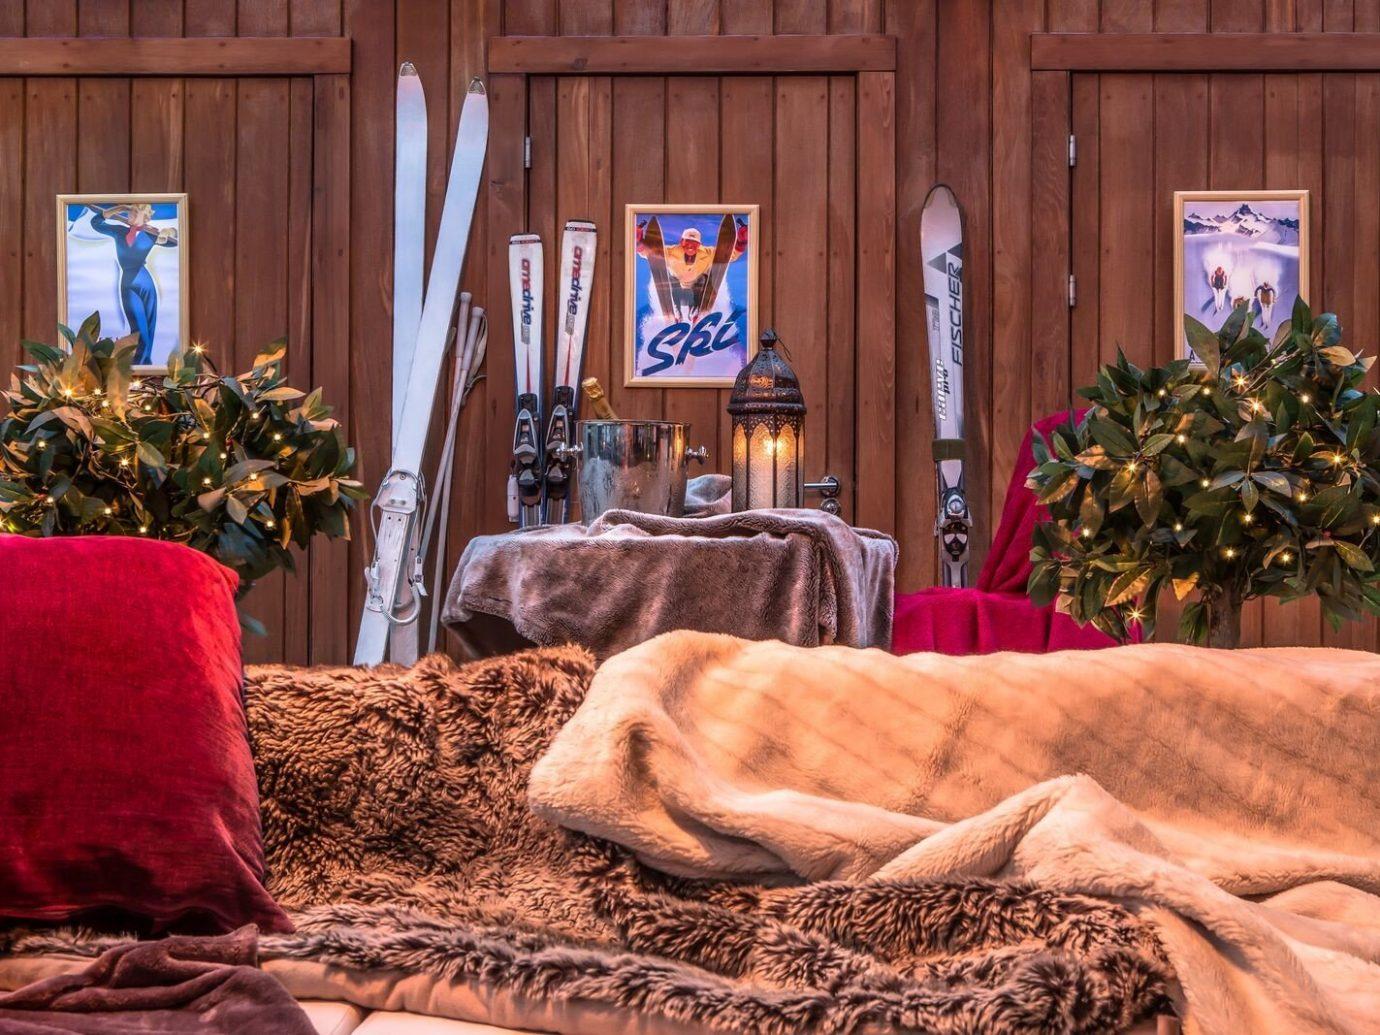 Food + Drink indoor home wood backyard living room sofa seat bedclothes